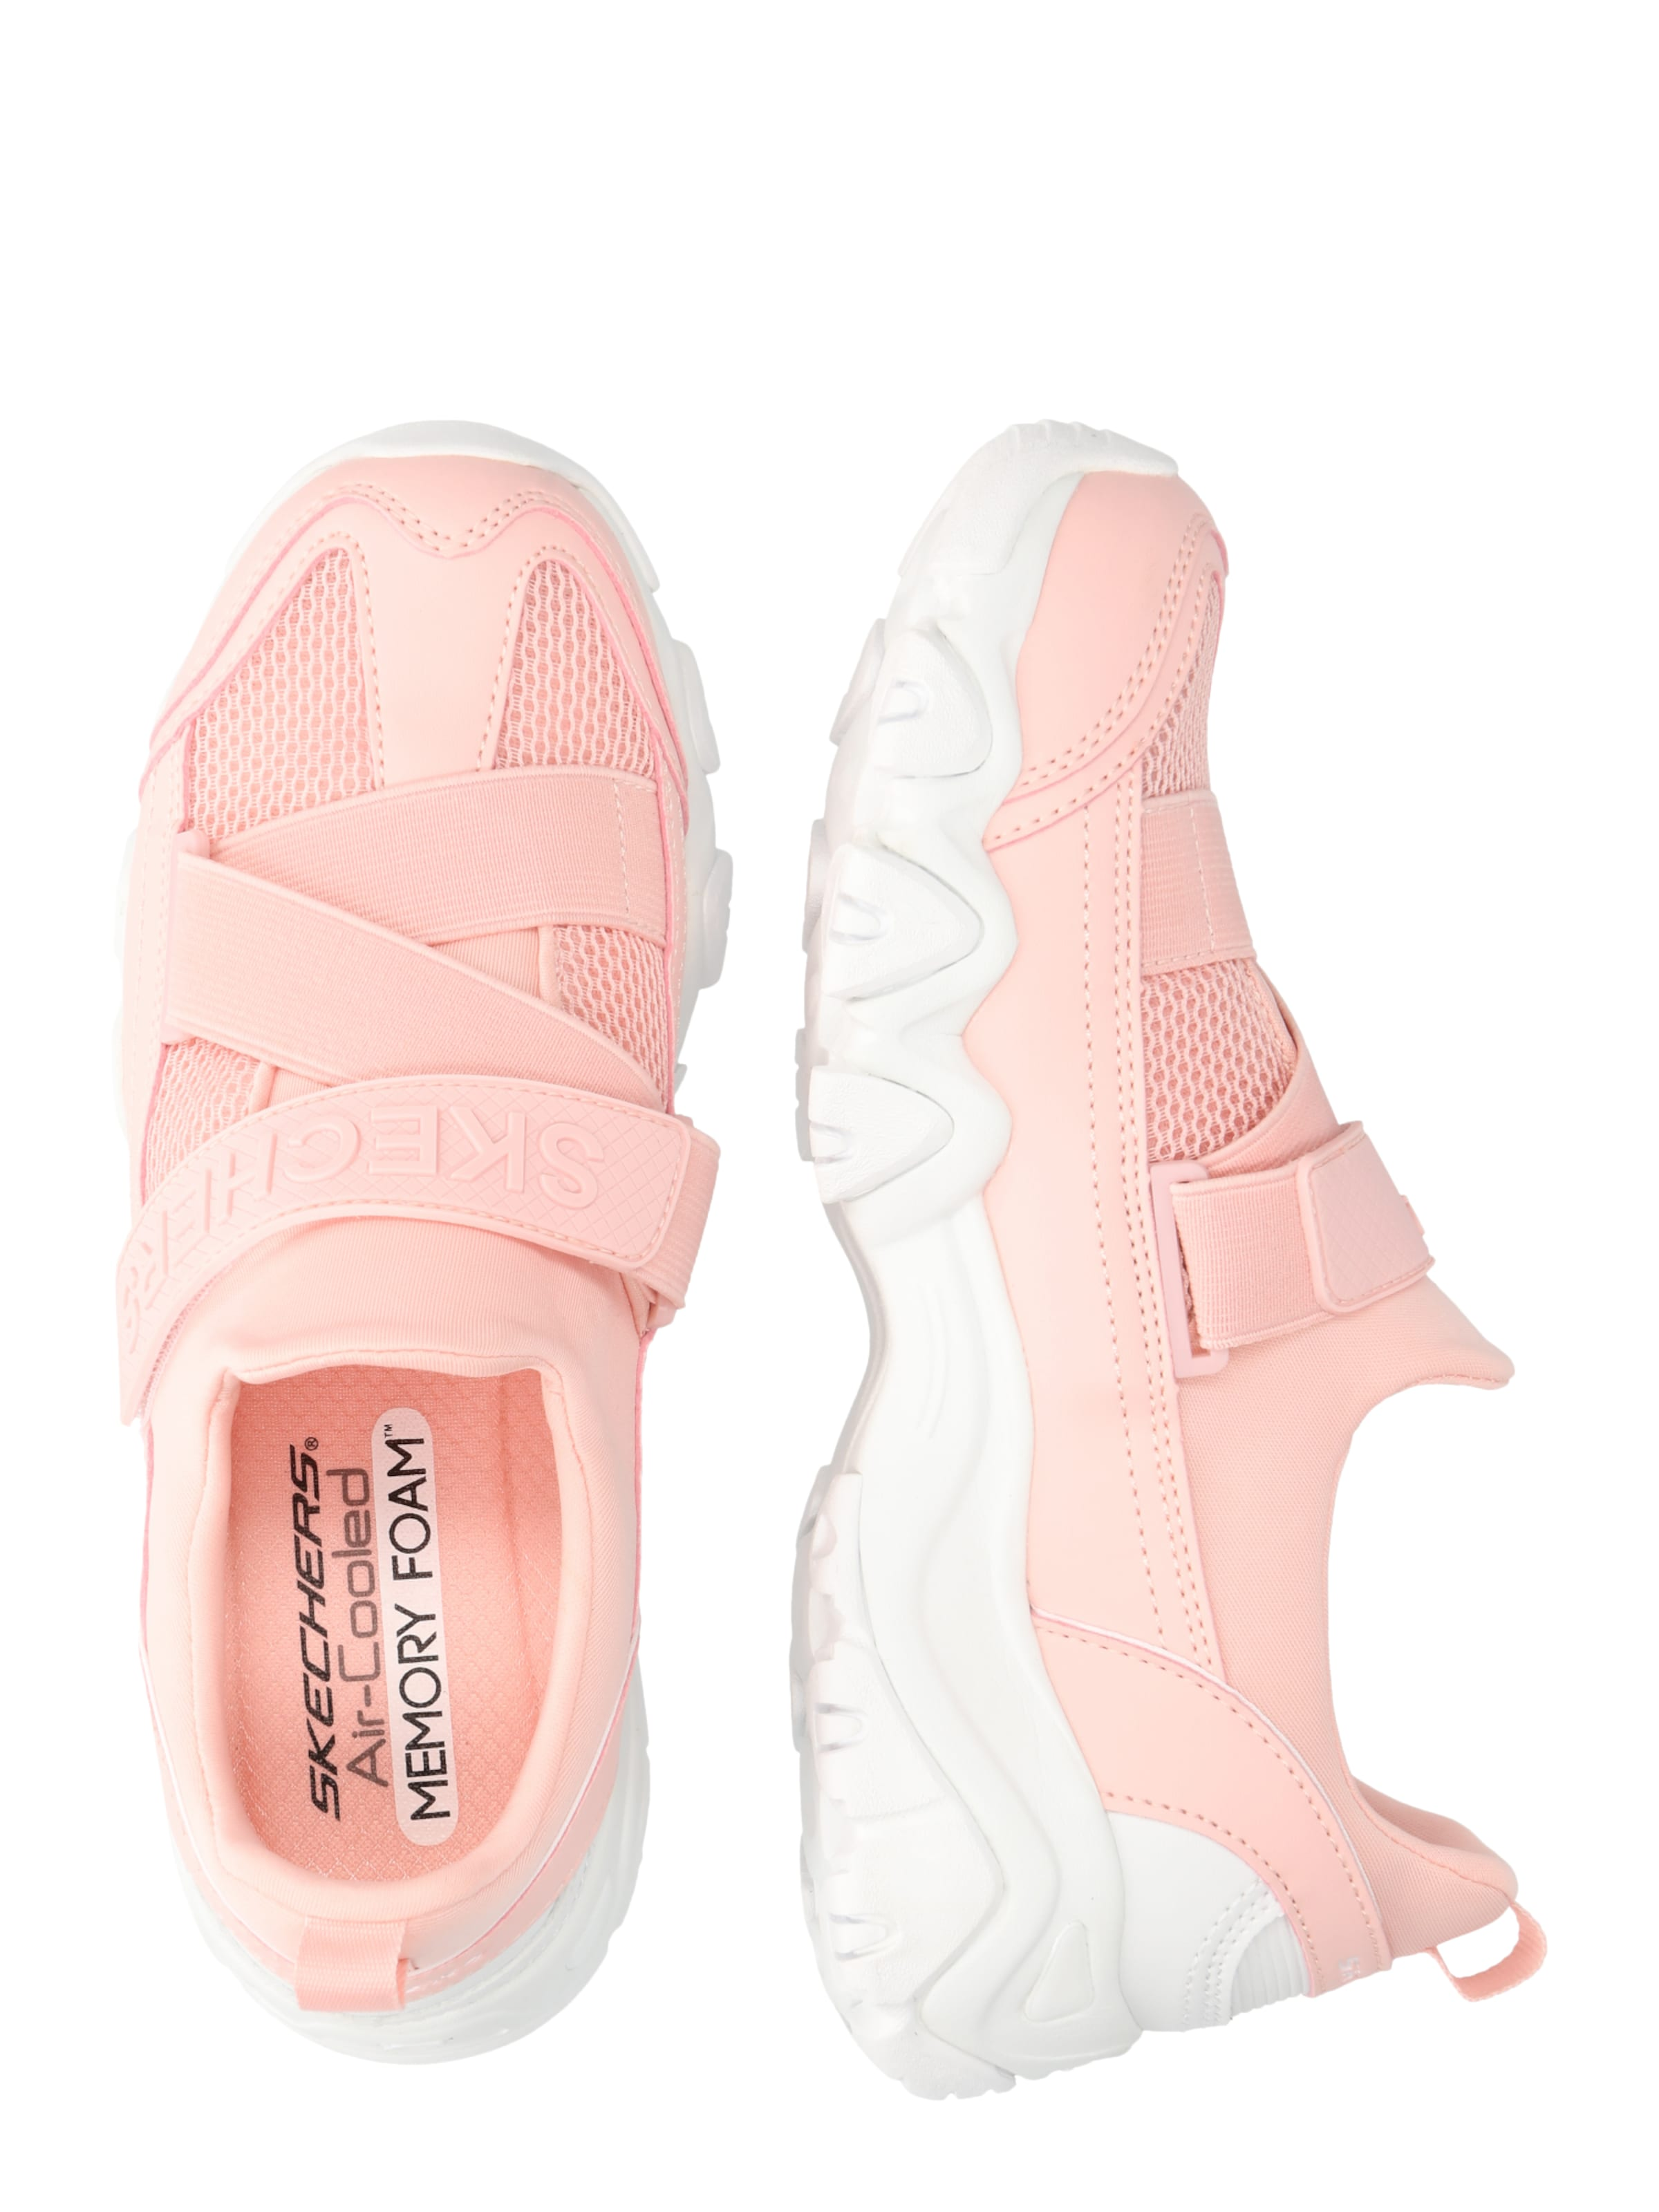 SKECHERS Sneaker 'D'LITES 2 - FAST LOOK' Spielraum Günstig Online Bester Platz gRAkDSOwrS